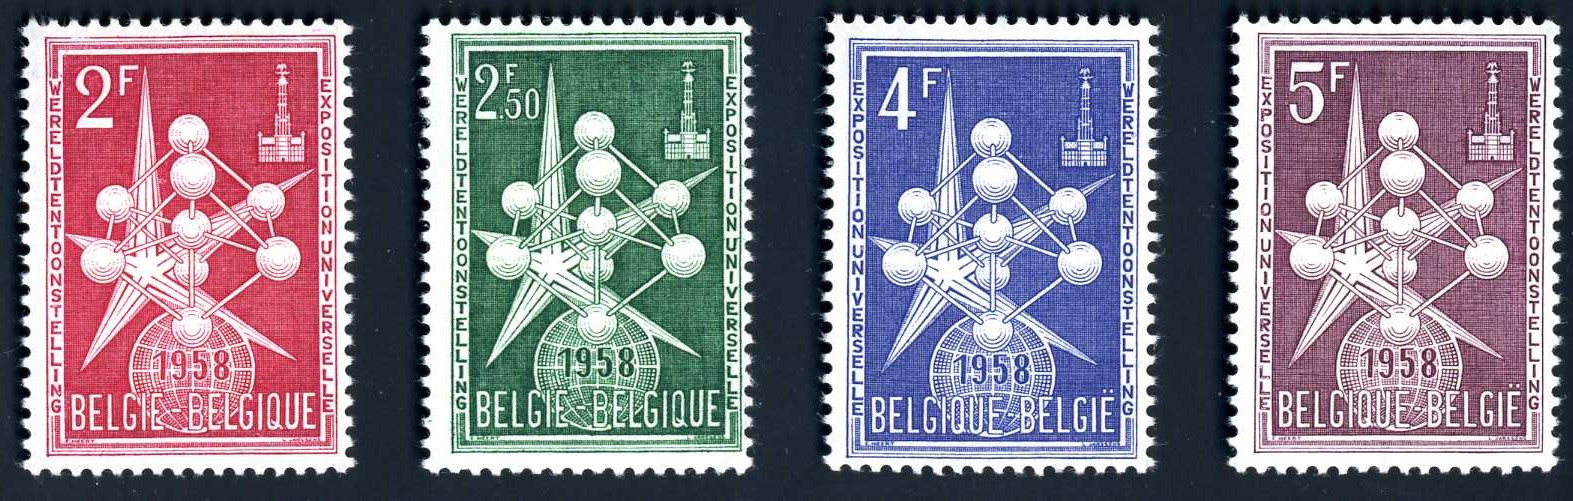 BE 018 1958 Atomium.jpg